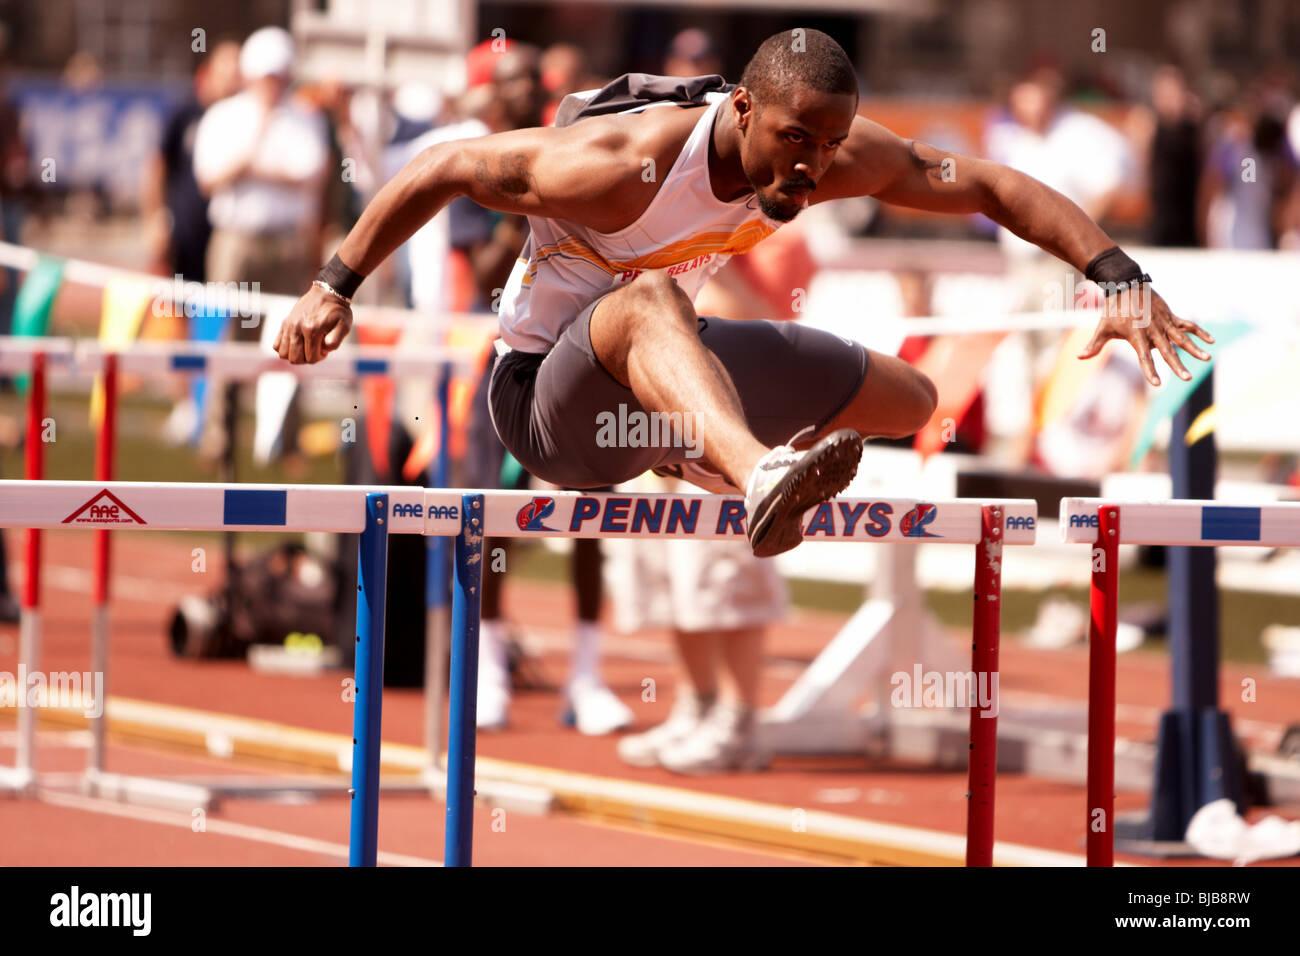 April 25, 2008. University of Pennsylvania. Penn Relays 2008. Hurdler completes the hurdle. - Stock Image